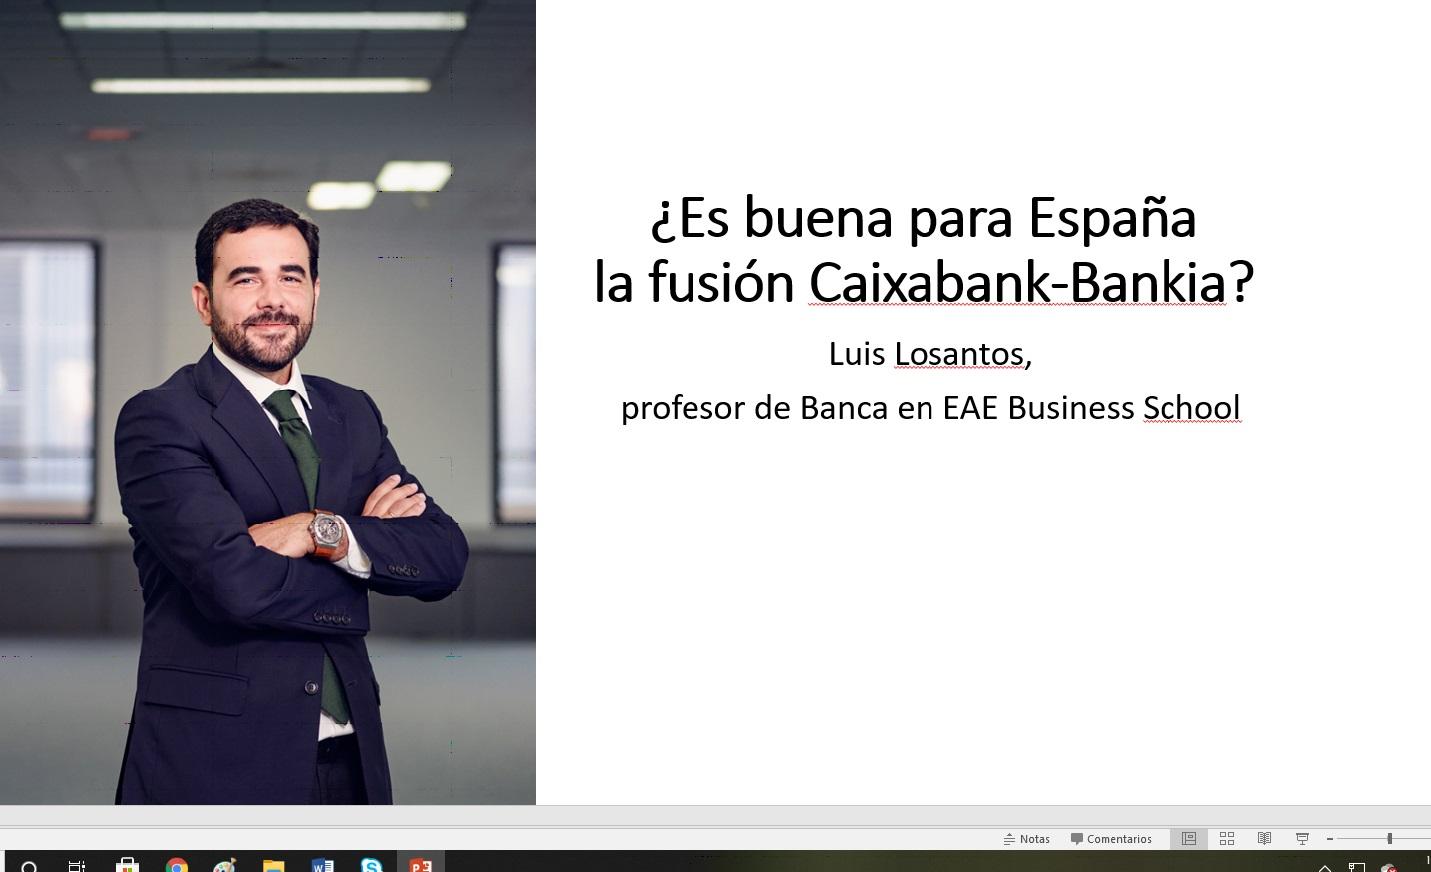 luis-losantos-fusion-caixa-bankia-rsc